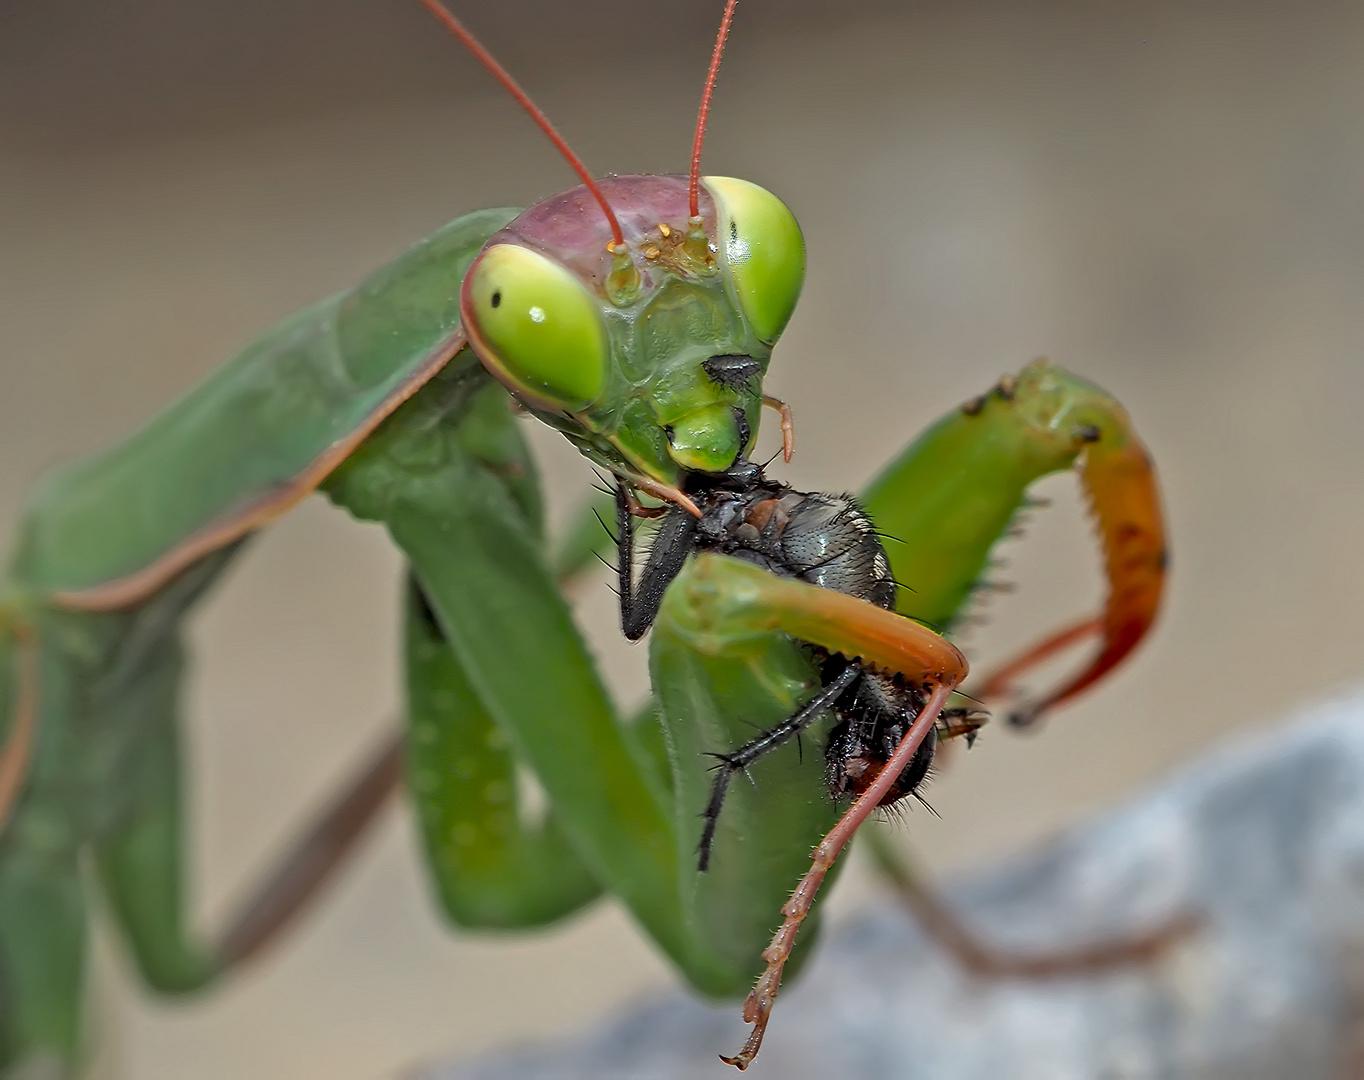 Gottesanbeterin (Mantis religiosa): Der grosse Hunger! Foto 3 - La mante religieuse a faim!